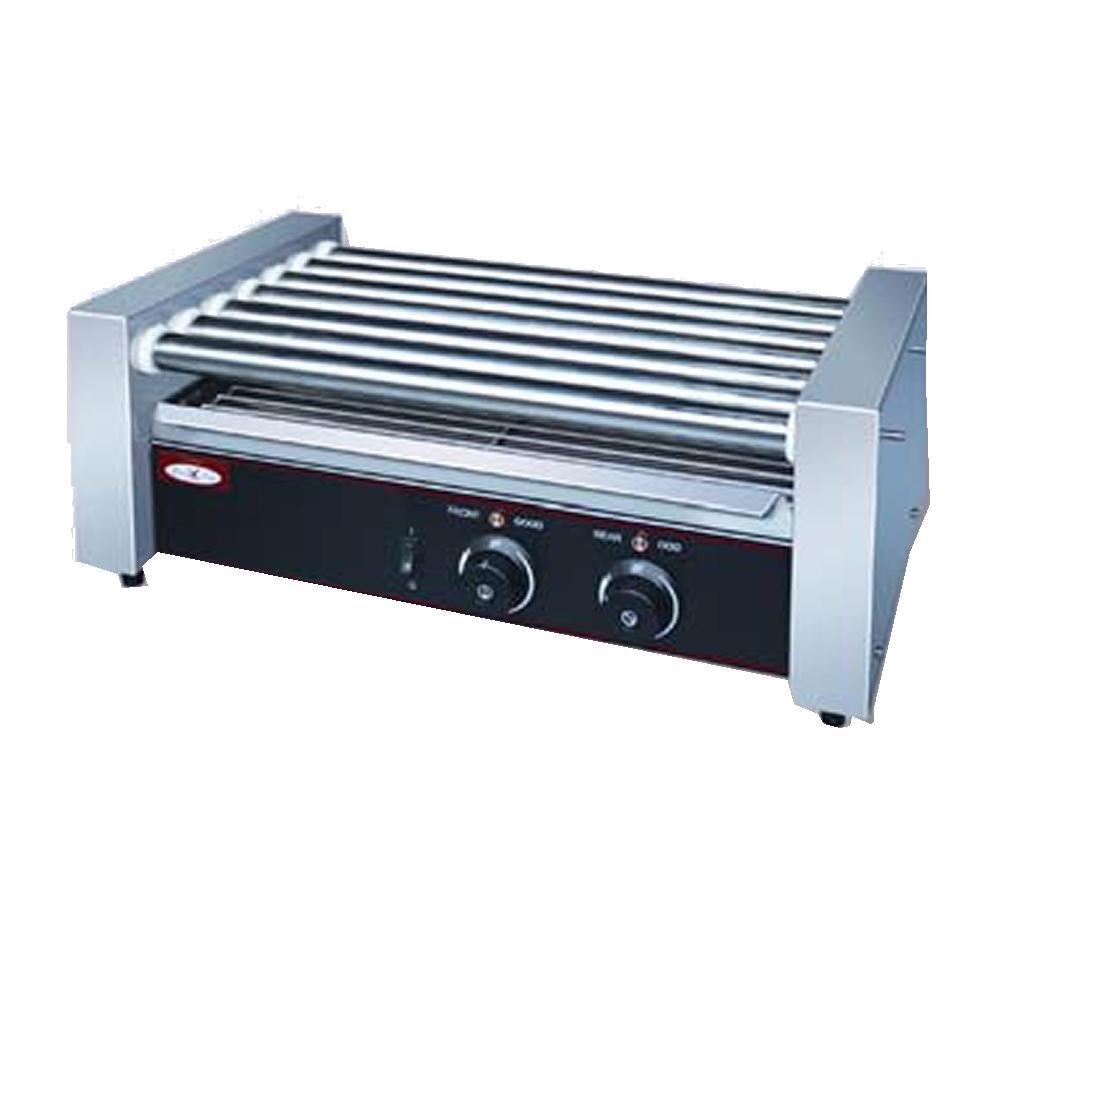 Rolling hotdog grill 9 rollers - THD-09KW